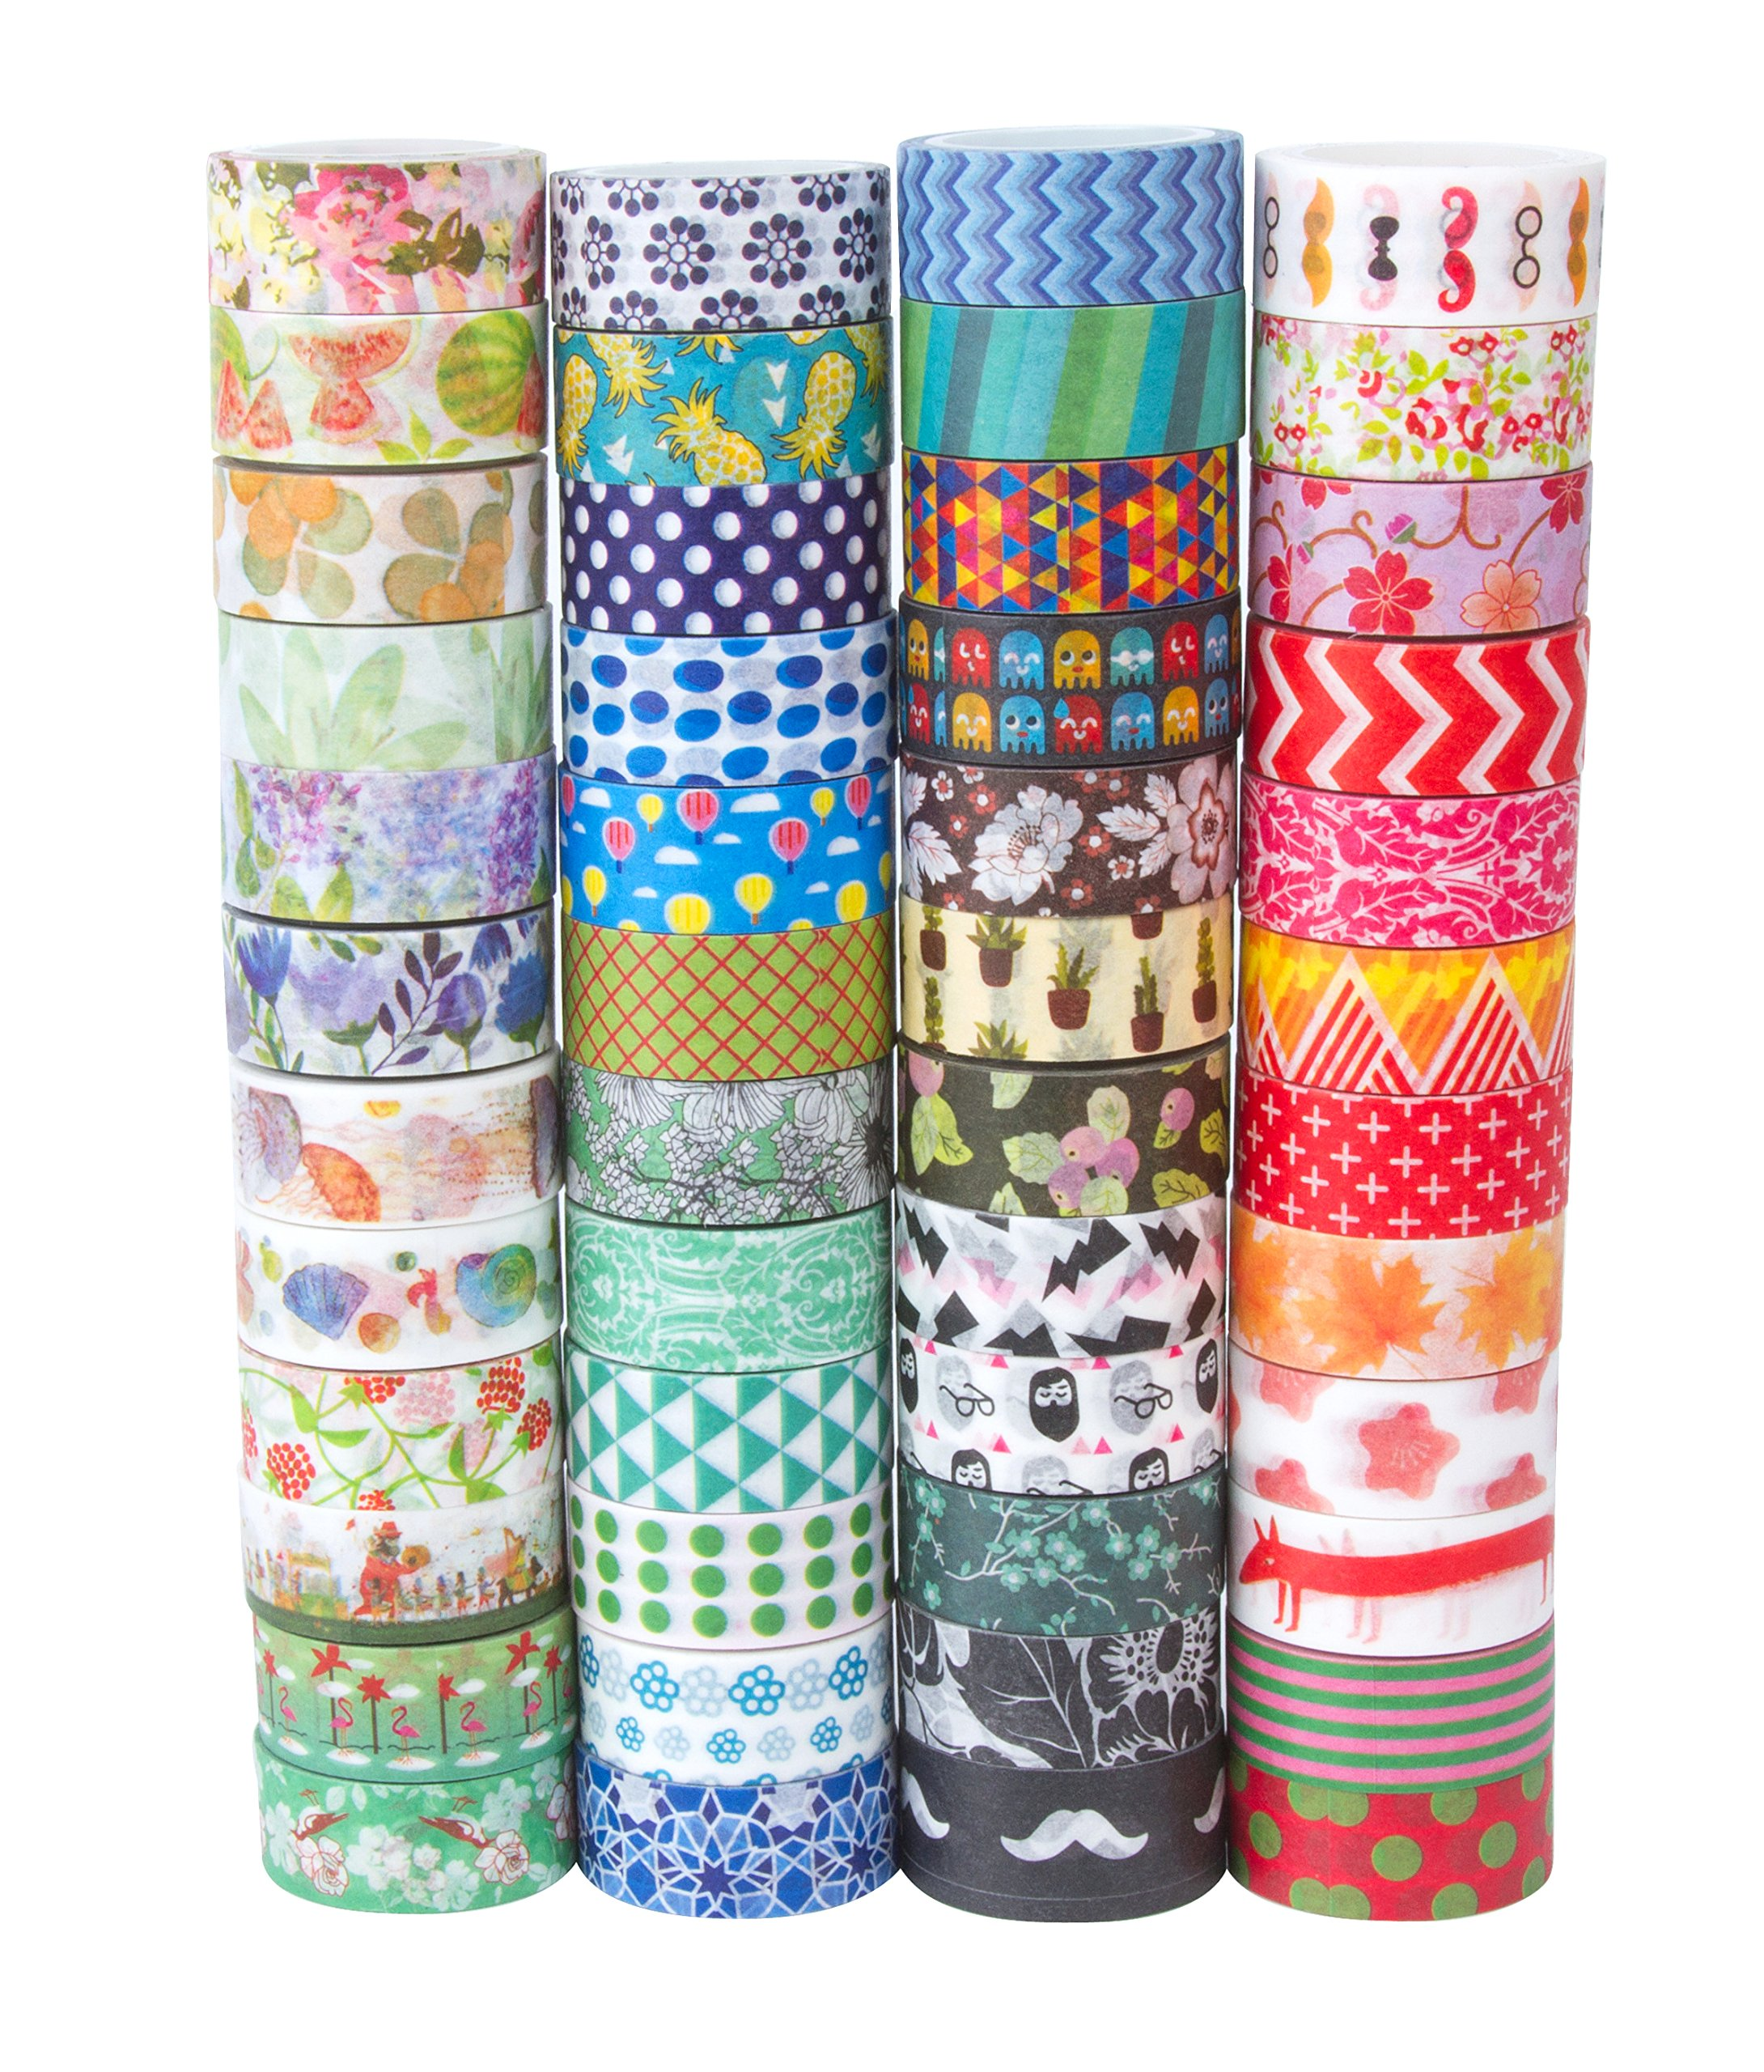 48 Rolls Washi Tape Set,Decorative Washi Masking Tape Set for DIY Crafts and Gift Wrapping (mix)